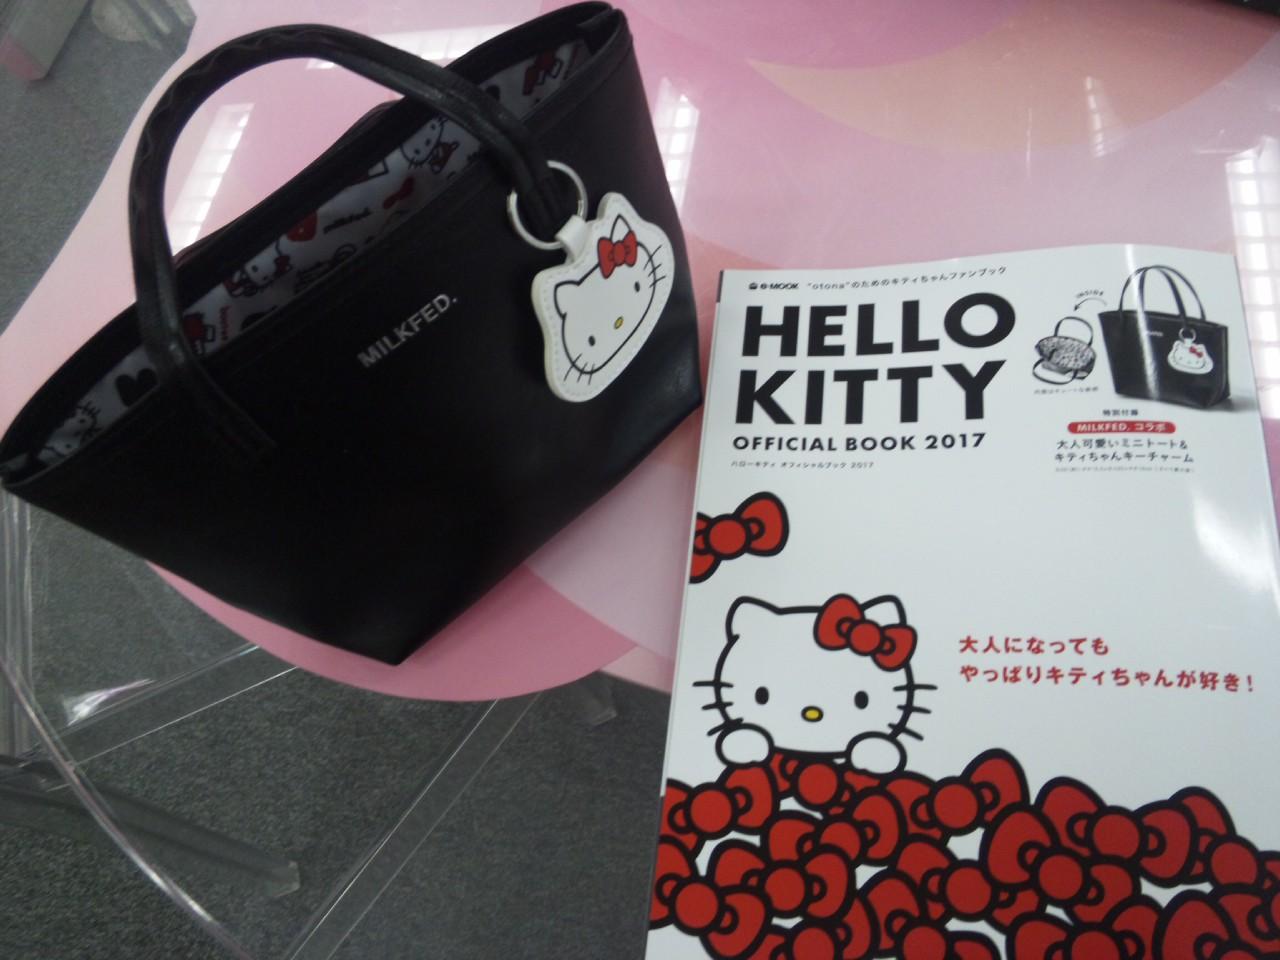 HELLO KITTYオフィシャルブック!